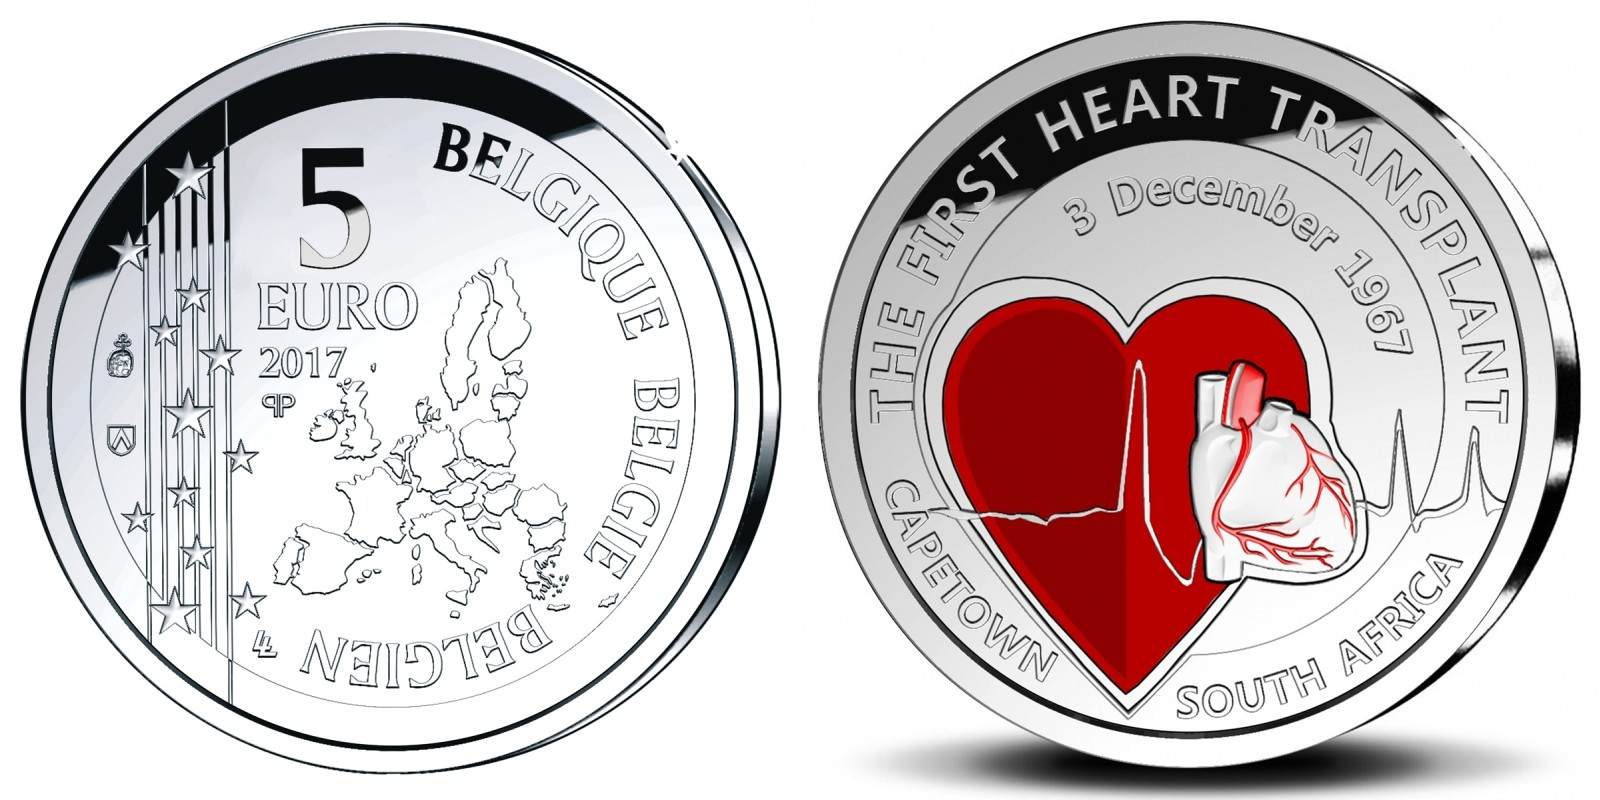 belgique 2017 transplantation cardiaque